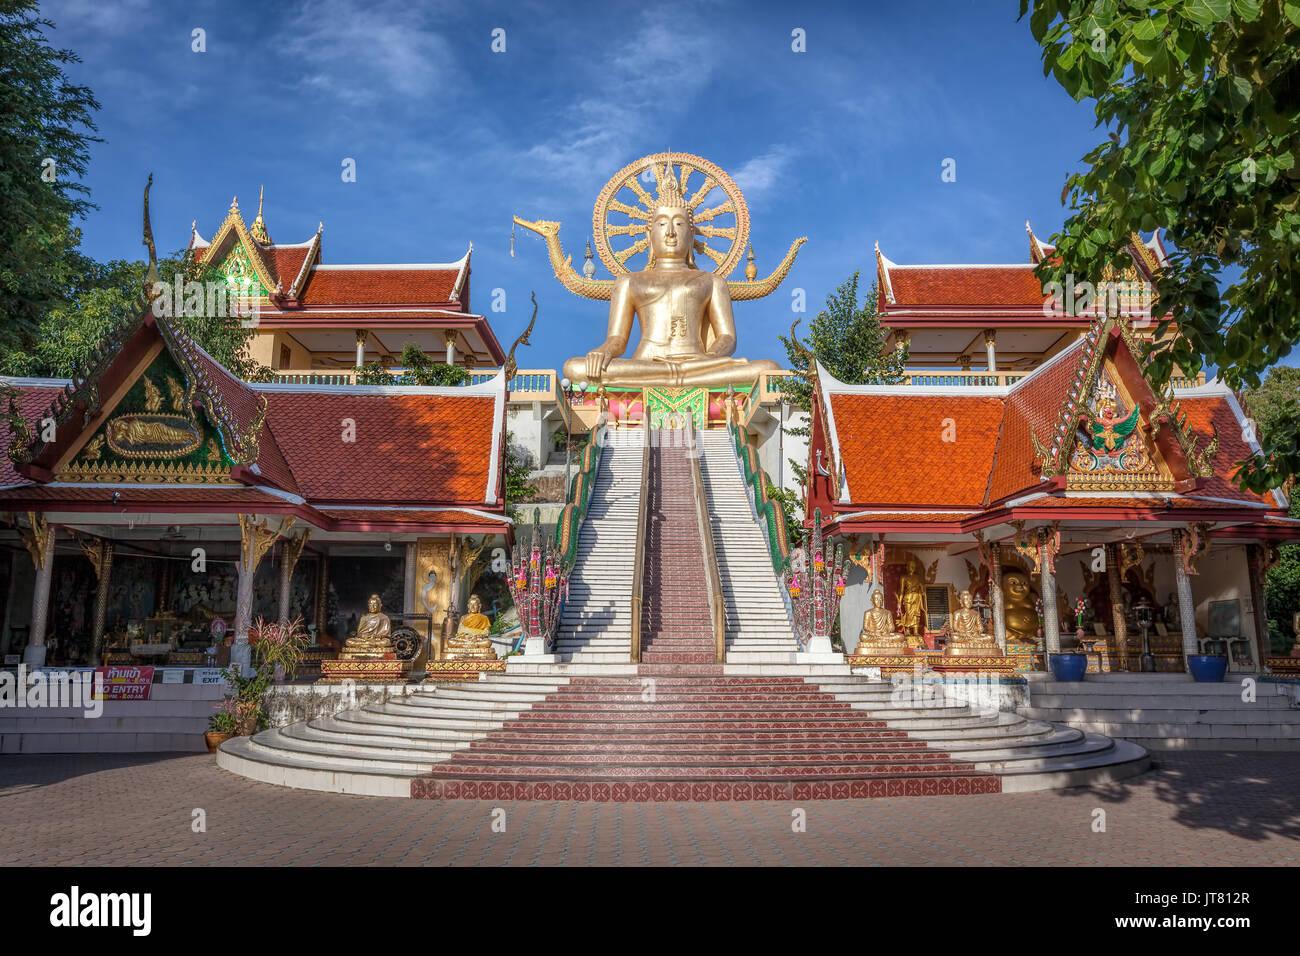 Big Buddha o il tempio di Wat Phra Yai in Kho Samui Island, Thailandia Immagini Stock